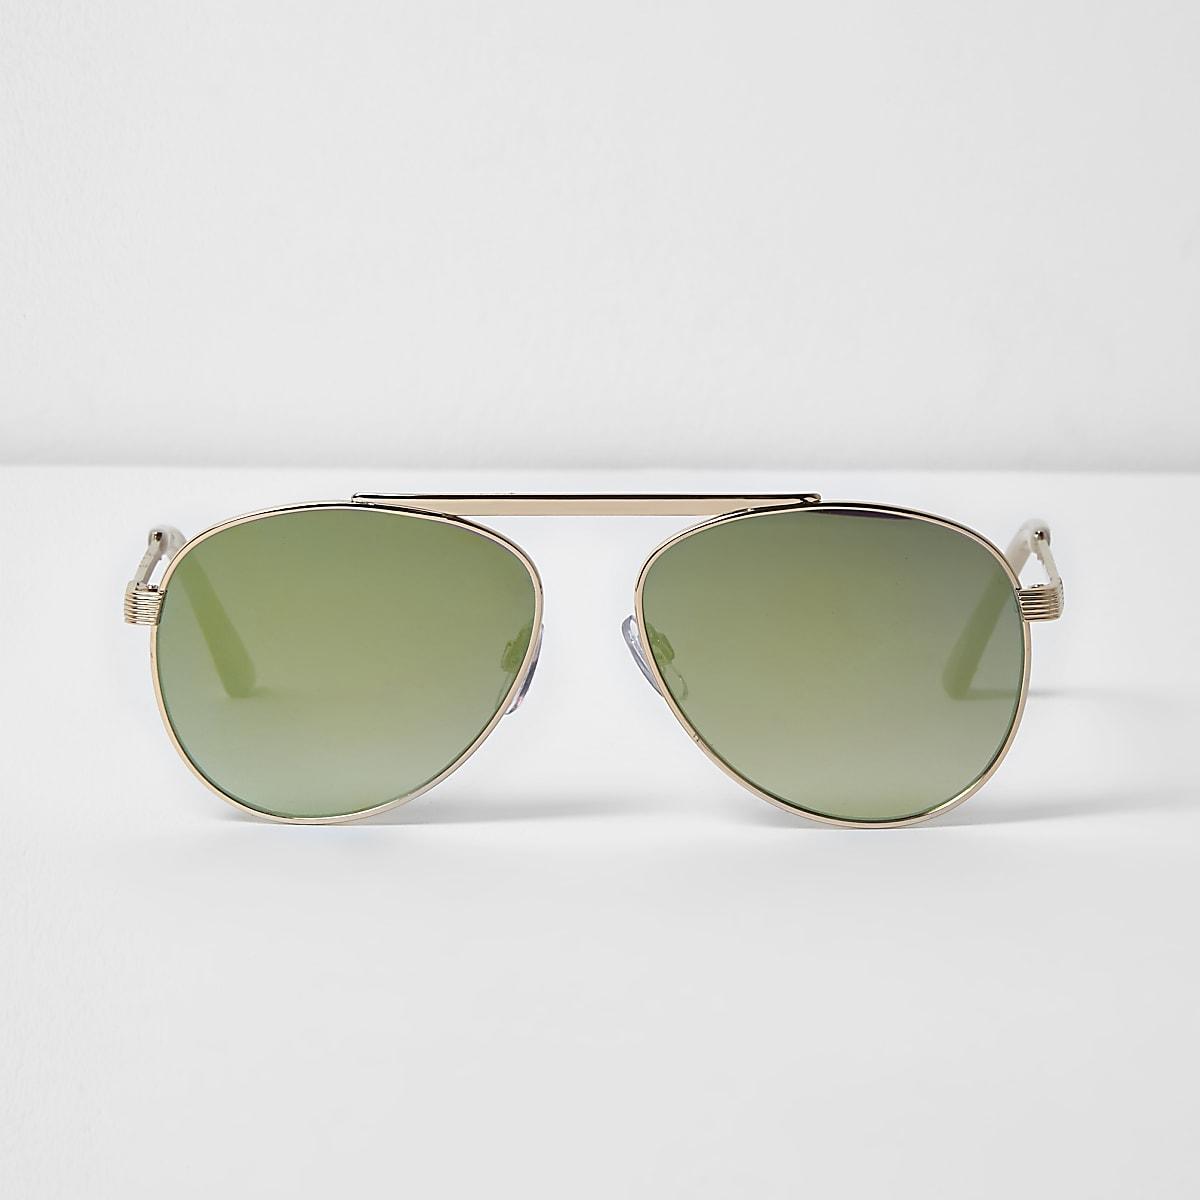 Gold tone brow bar green mirrored sunglasses